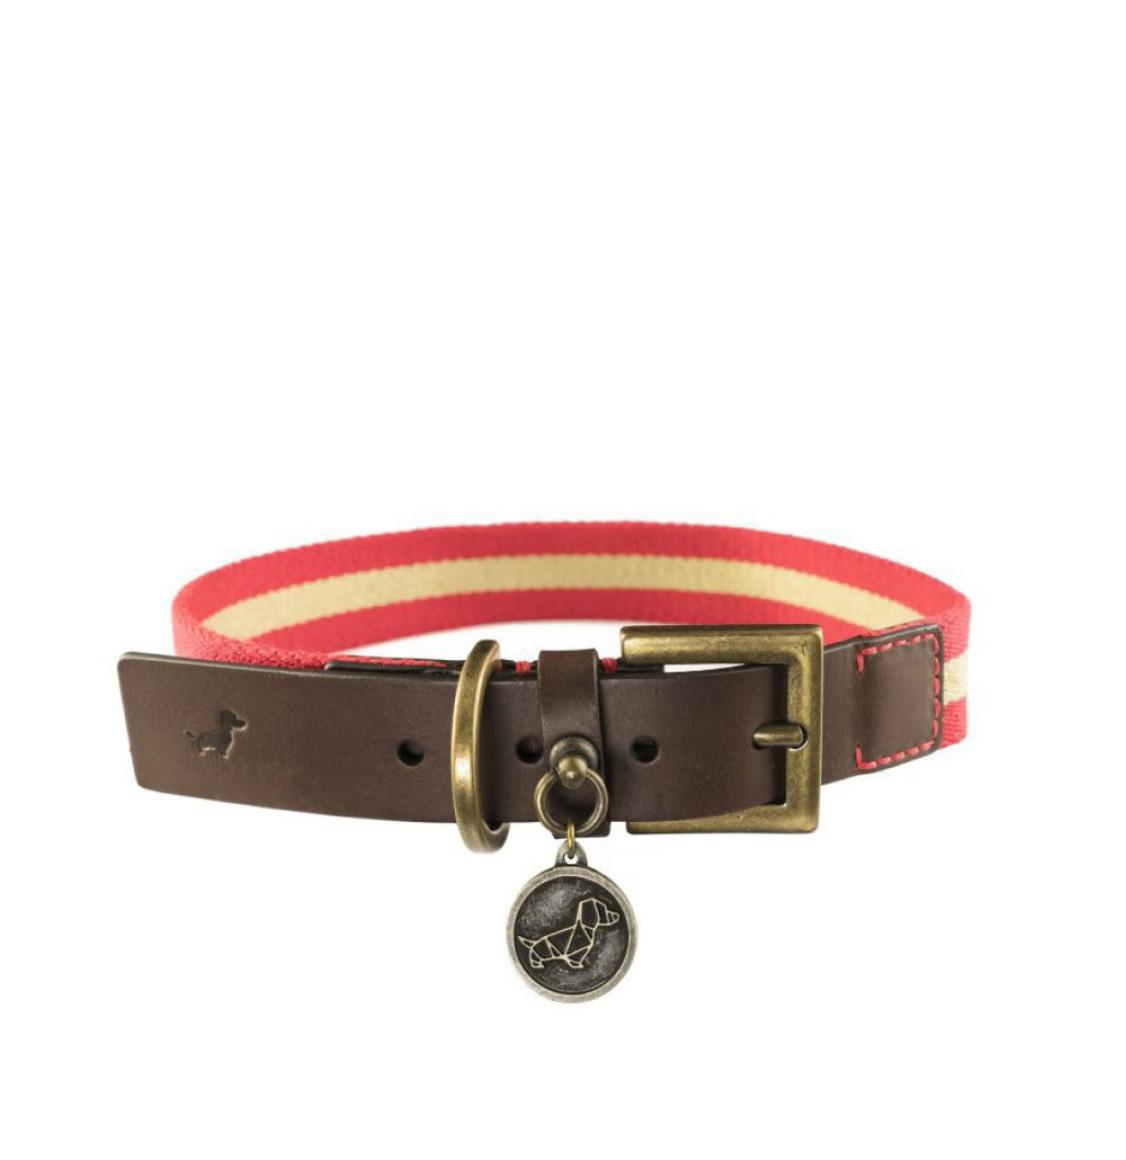 Poldo Dog Couture Portofino Dog Collar